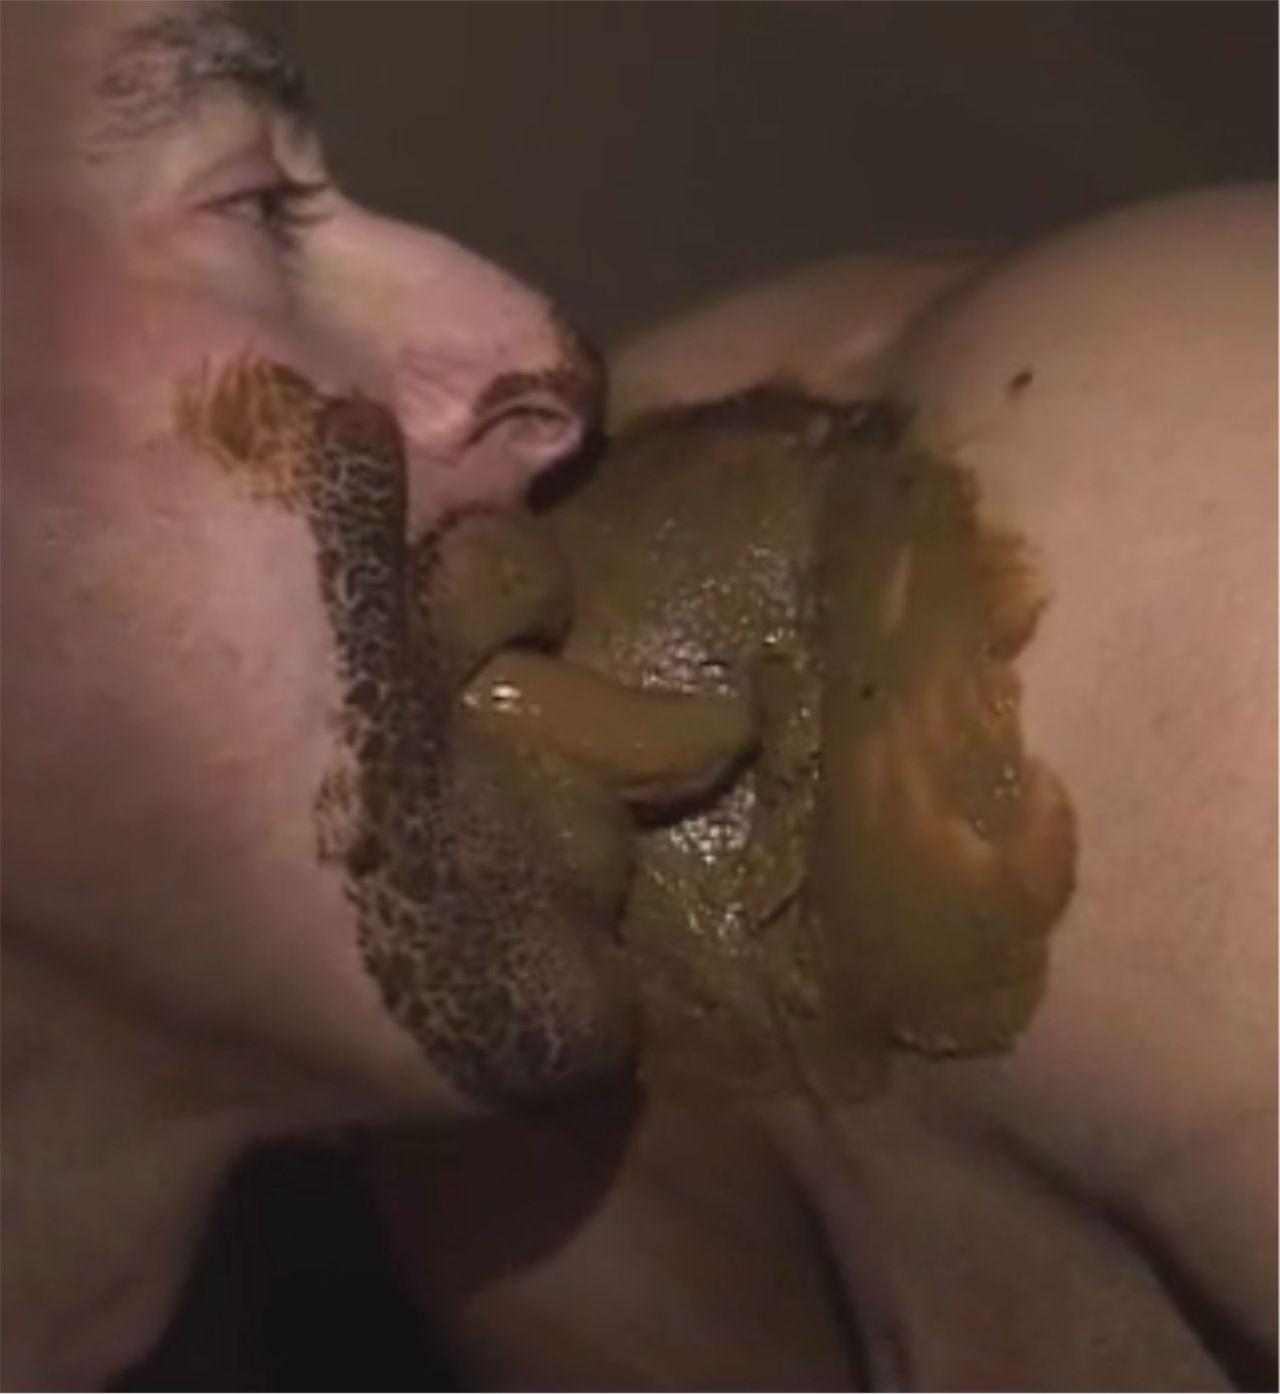 red itchy rash aournd anus